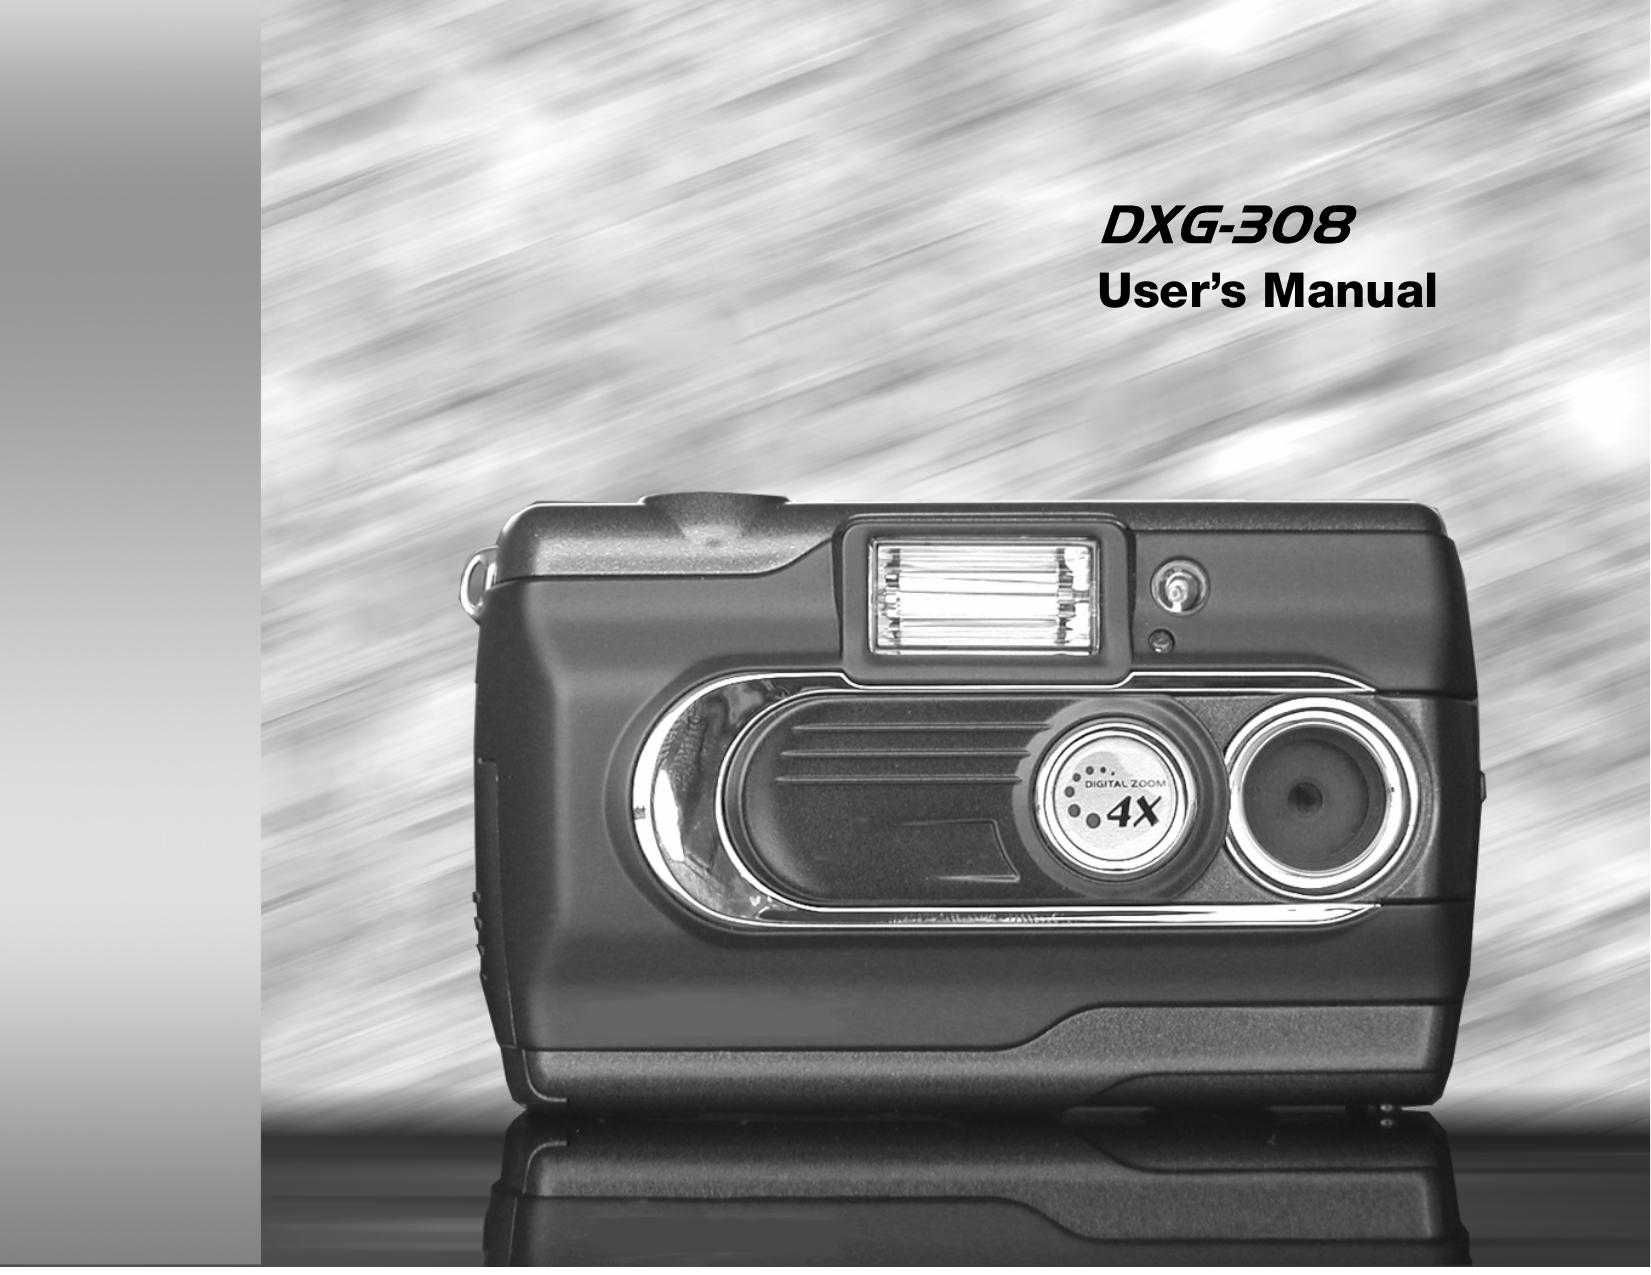 DXG 308 DOWNLOAD DRIVER